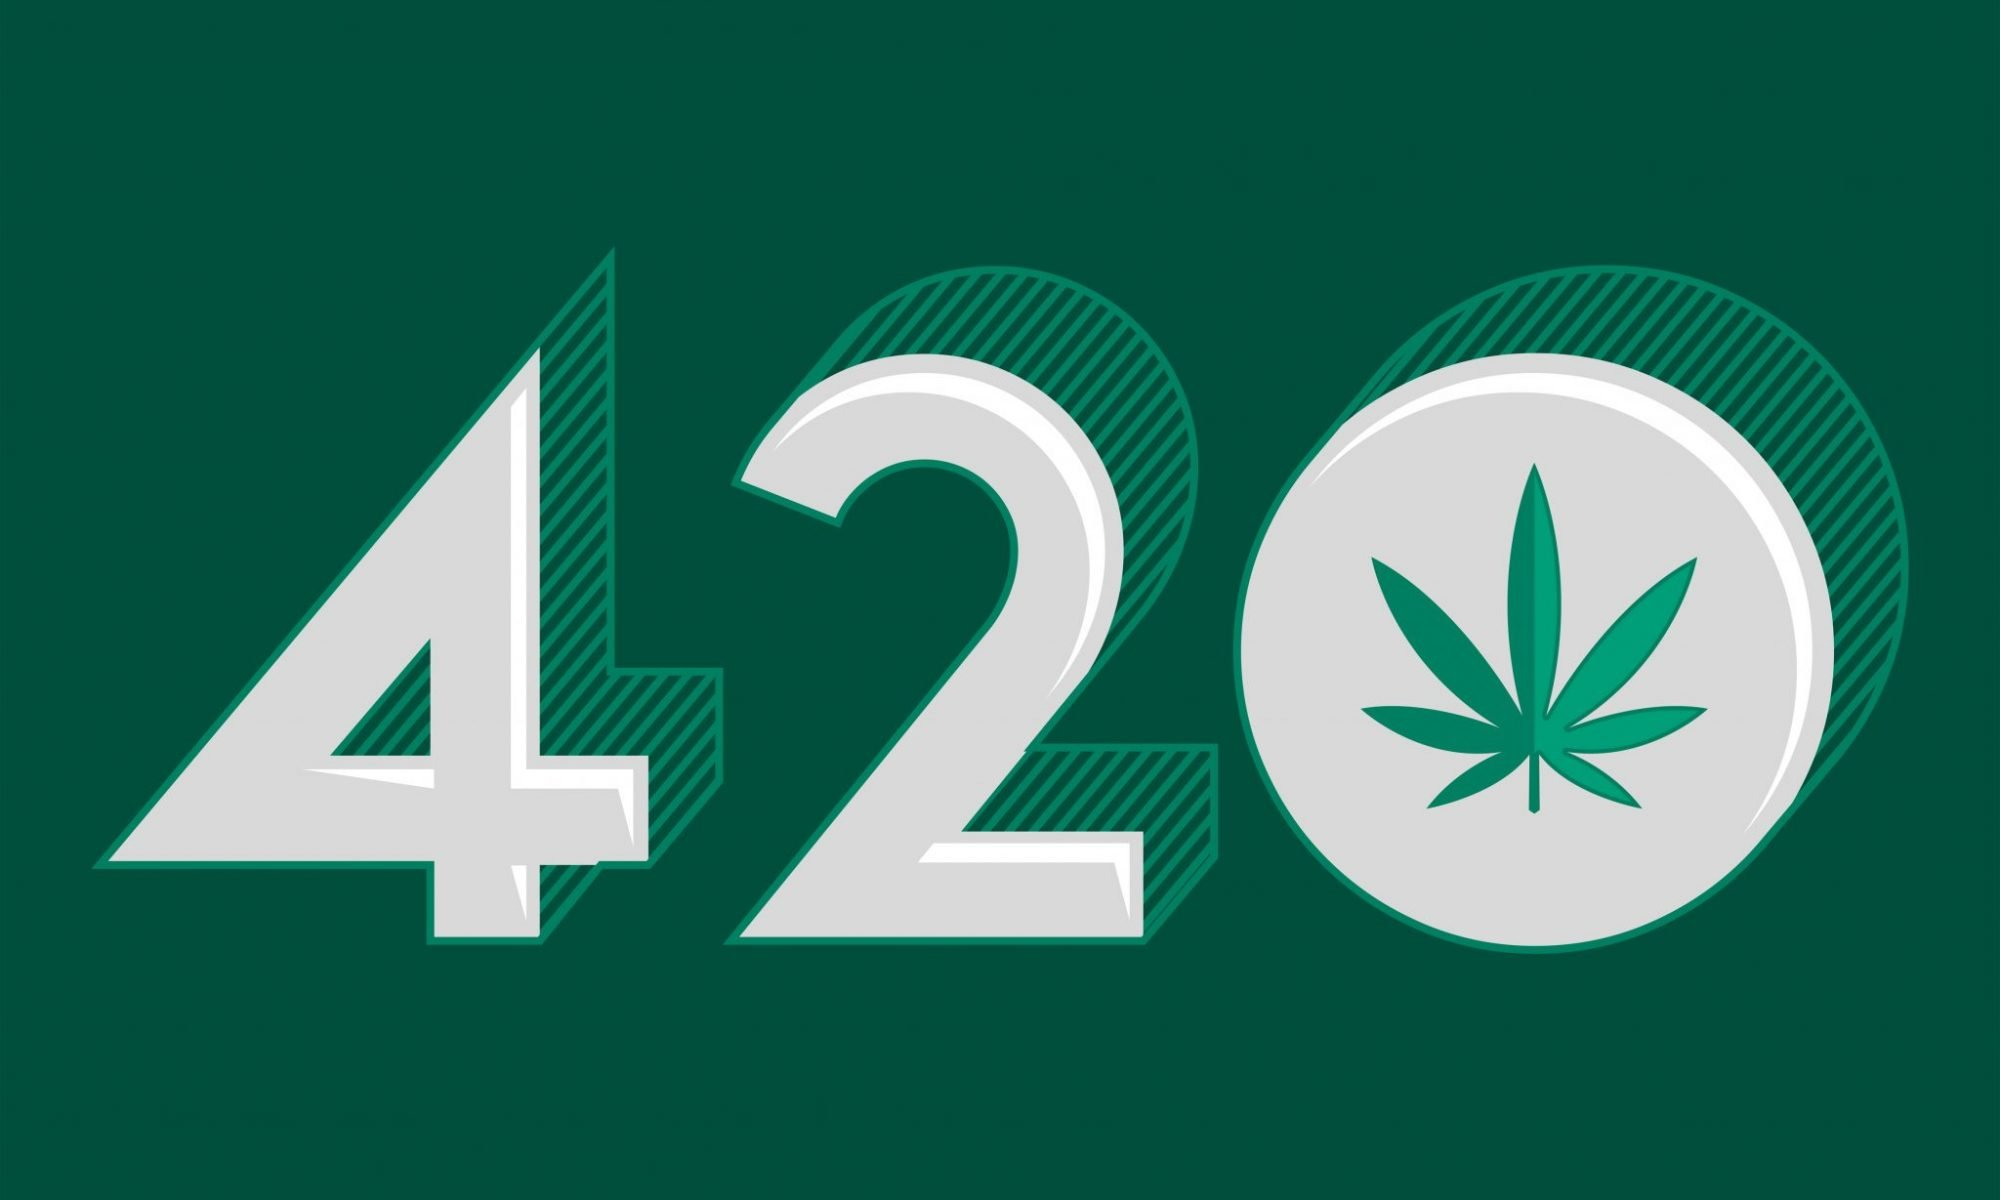 420 logo